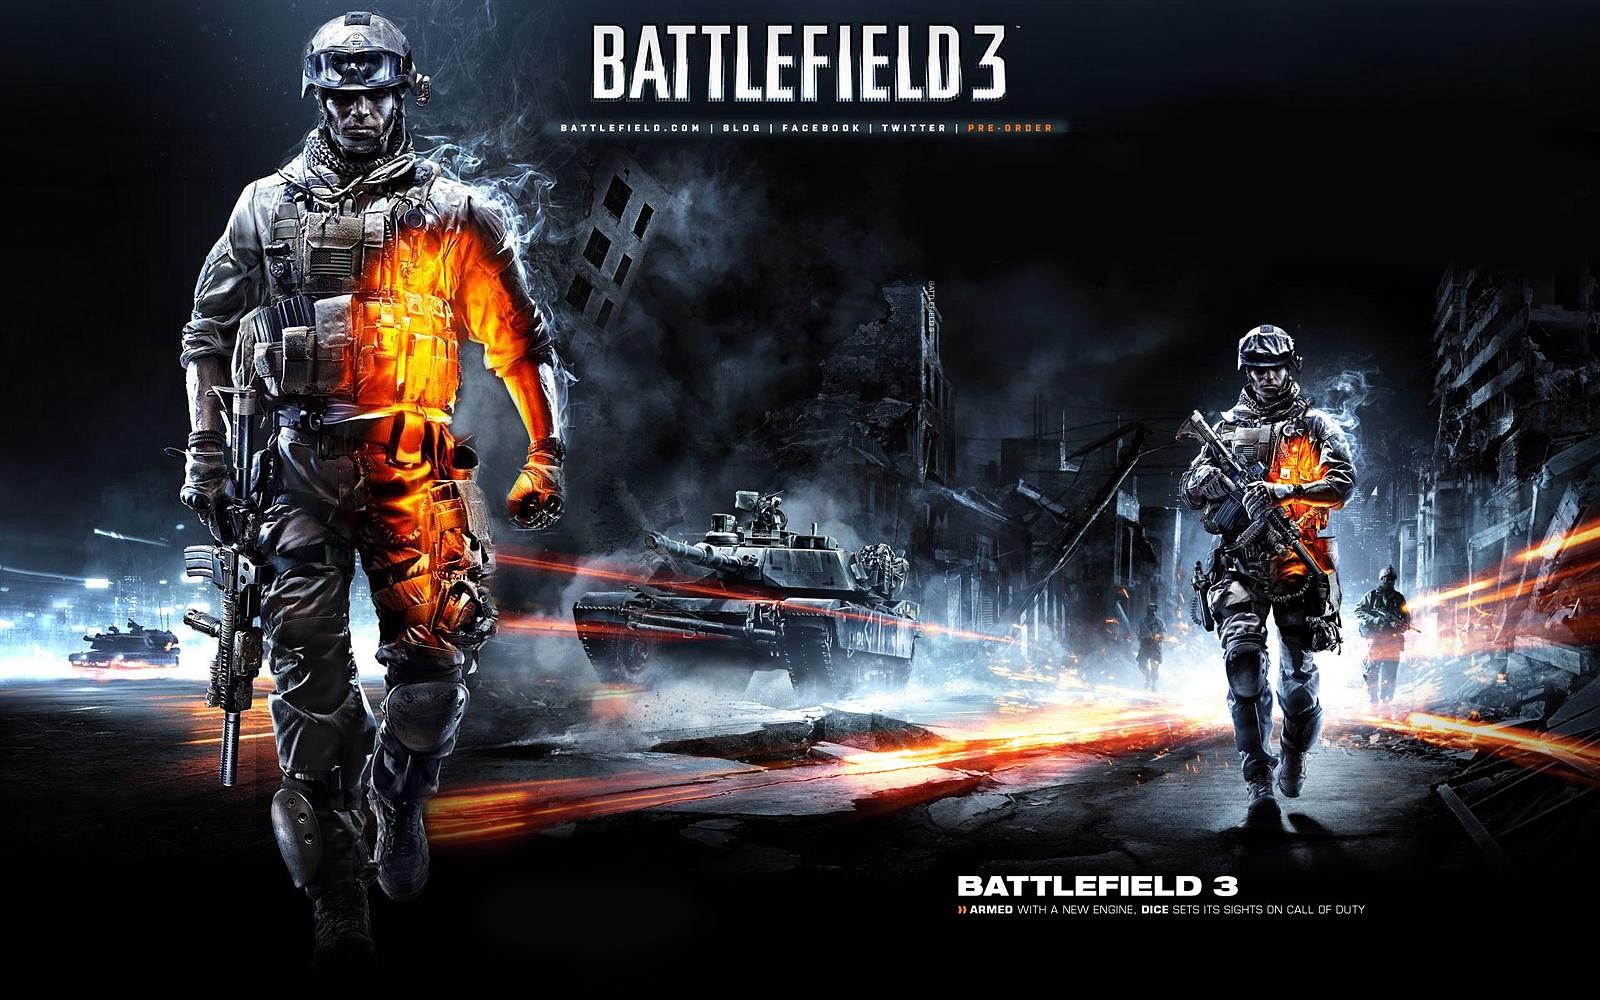 http://3.bp.blogspot.com/-jSbOAmLtDEk/TvZFH4oxDxI/AAAAAAAAbvE/T37_huw_yW8/s1600/battlefield_3_wallpaper_by_marvnation-d3bxppf.jpg